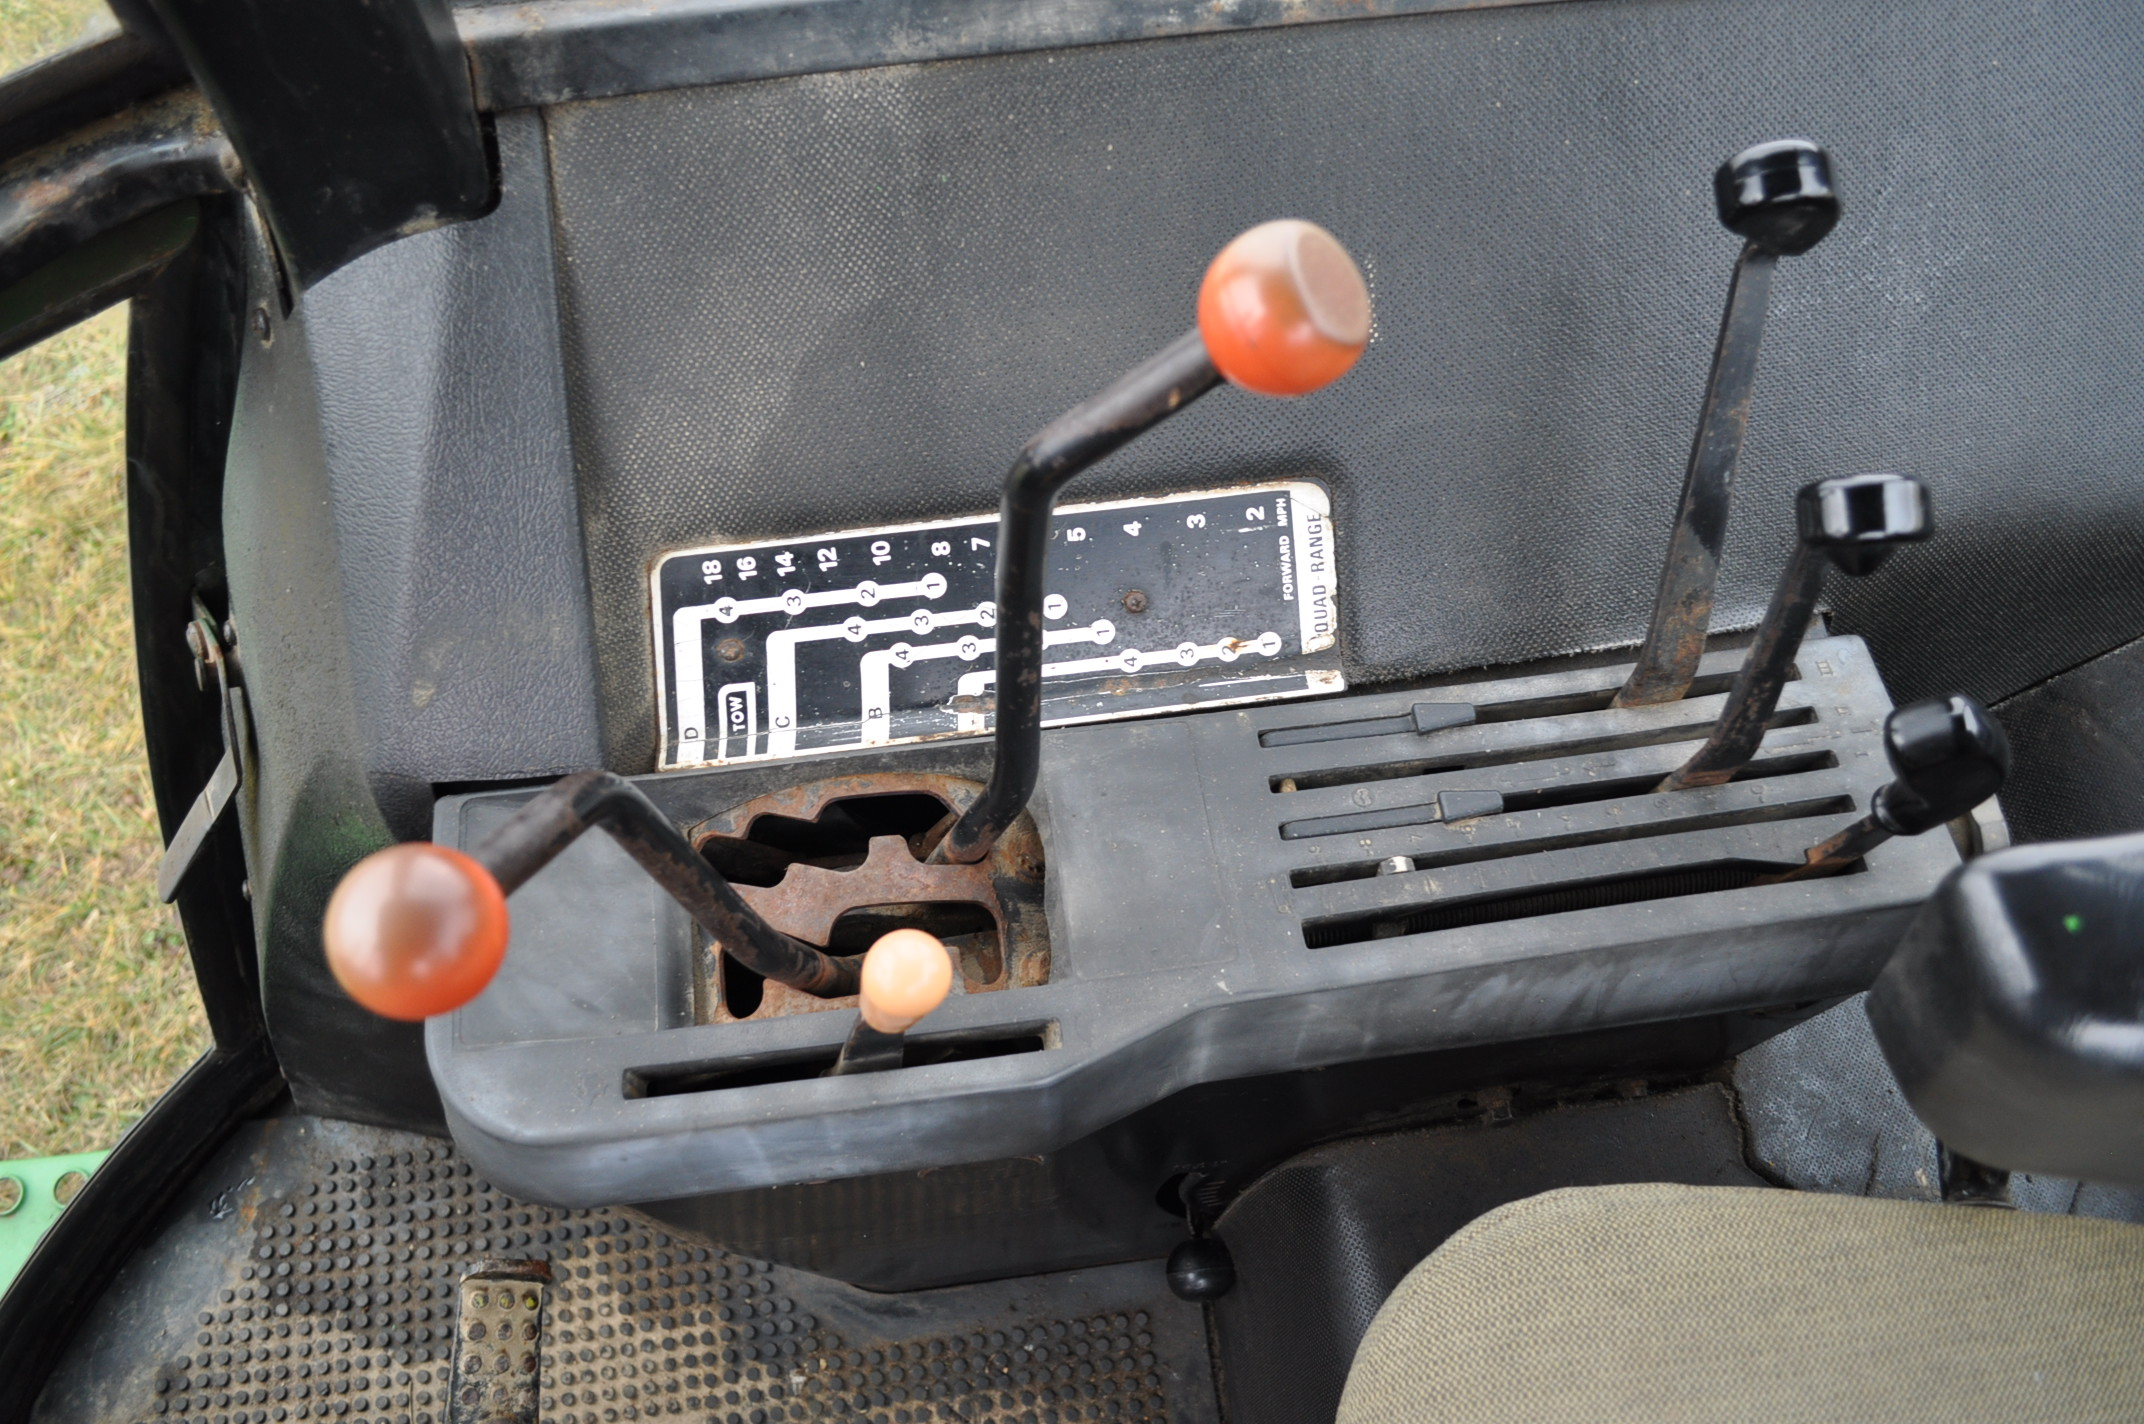 John Deere 4430 tractor, diesel, 18.4-34 hub duals, 10.00-16 front, CHA, Quad range, 2 hyd - Image 17 of 20